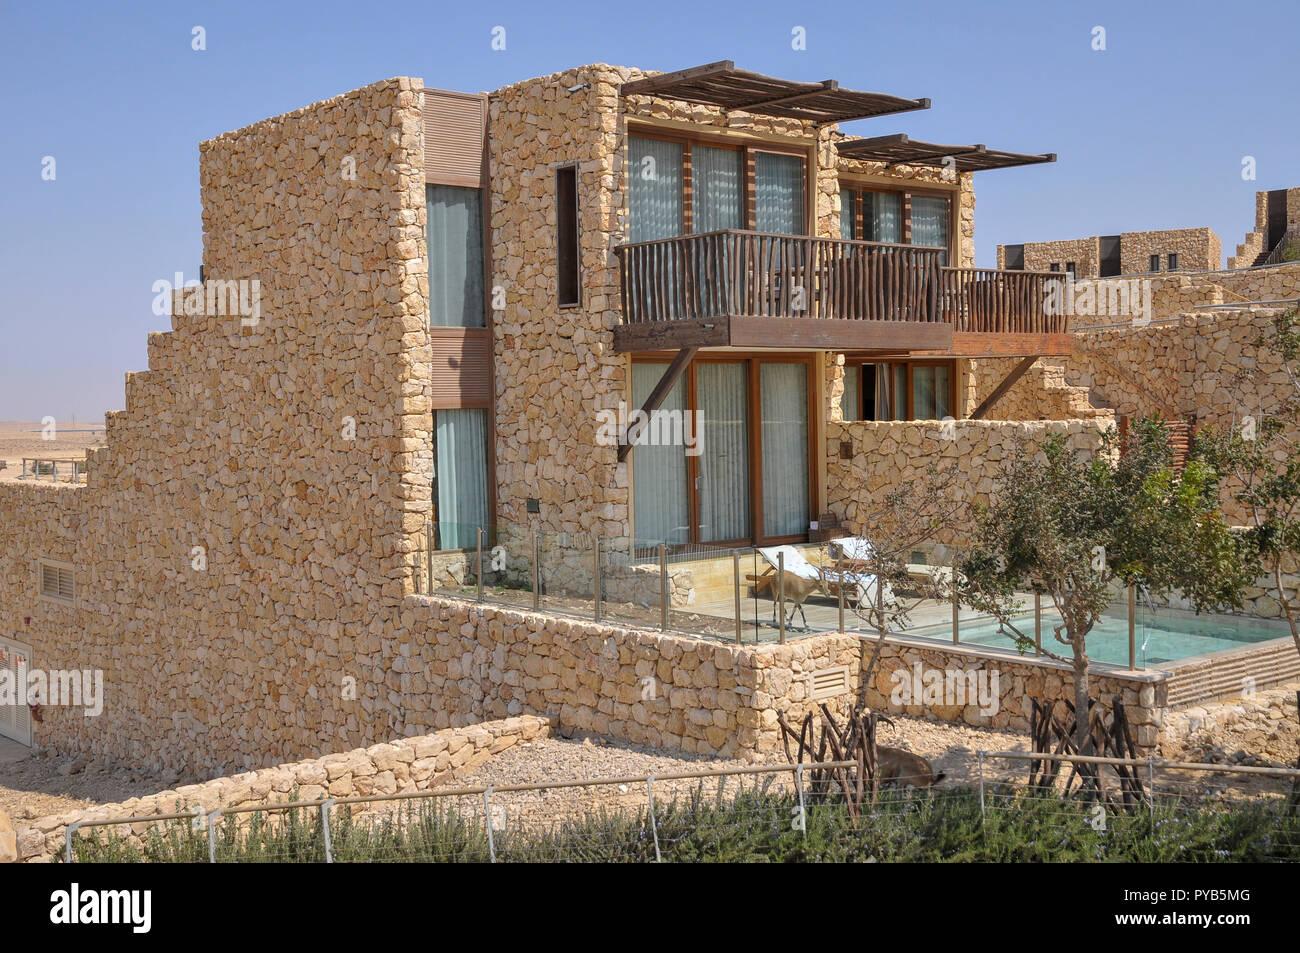 Israel, Negev, Beresheet (Genesis) Isrotel Hotel auf den Klippen von den Ramon Krater, Stockbild